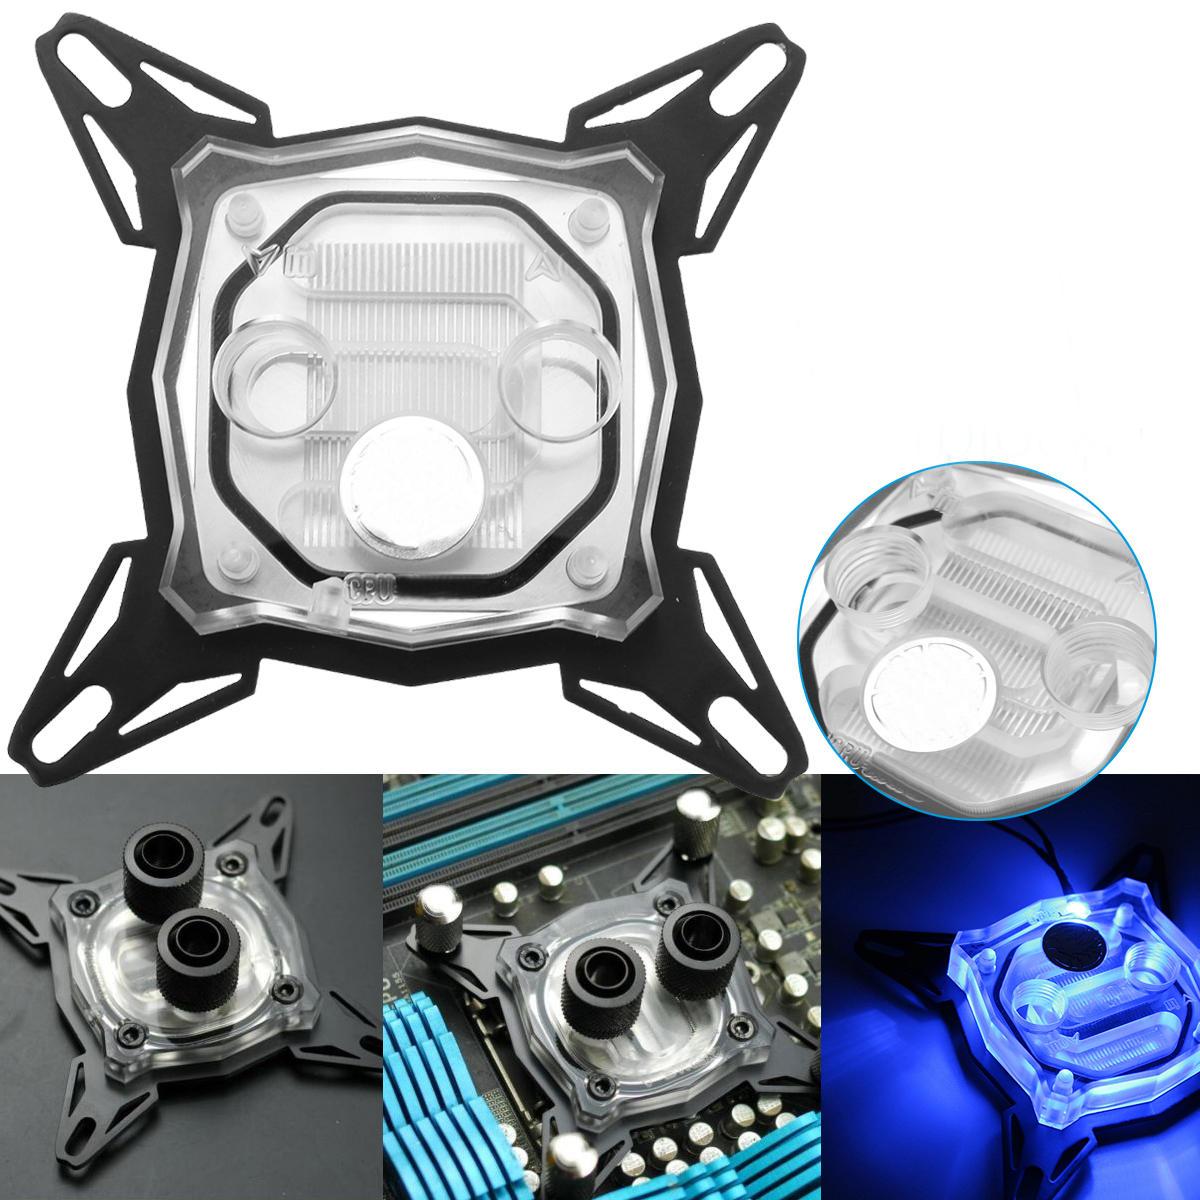 S SKYEE 9cmx9cmx2cm LED CPU Water Block Waterblock for INTEL Cooling